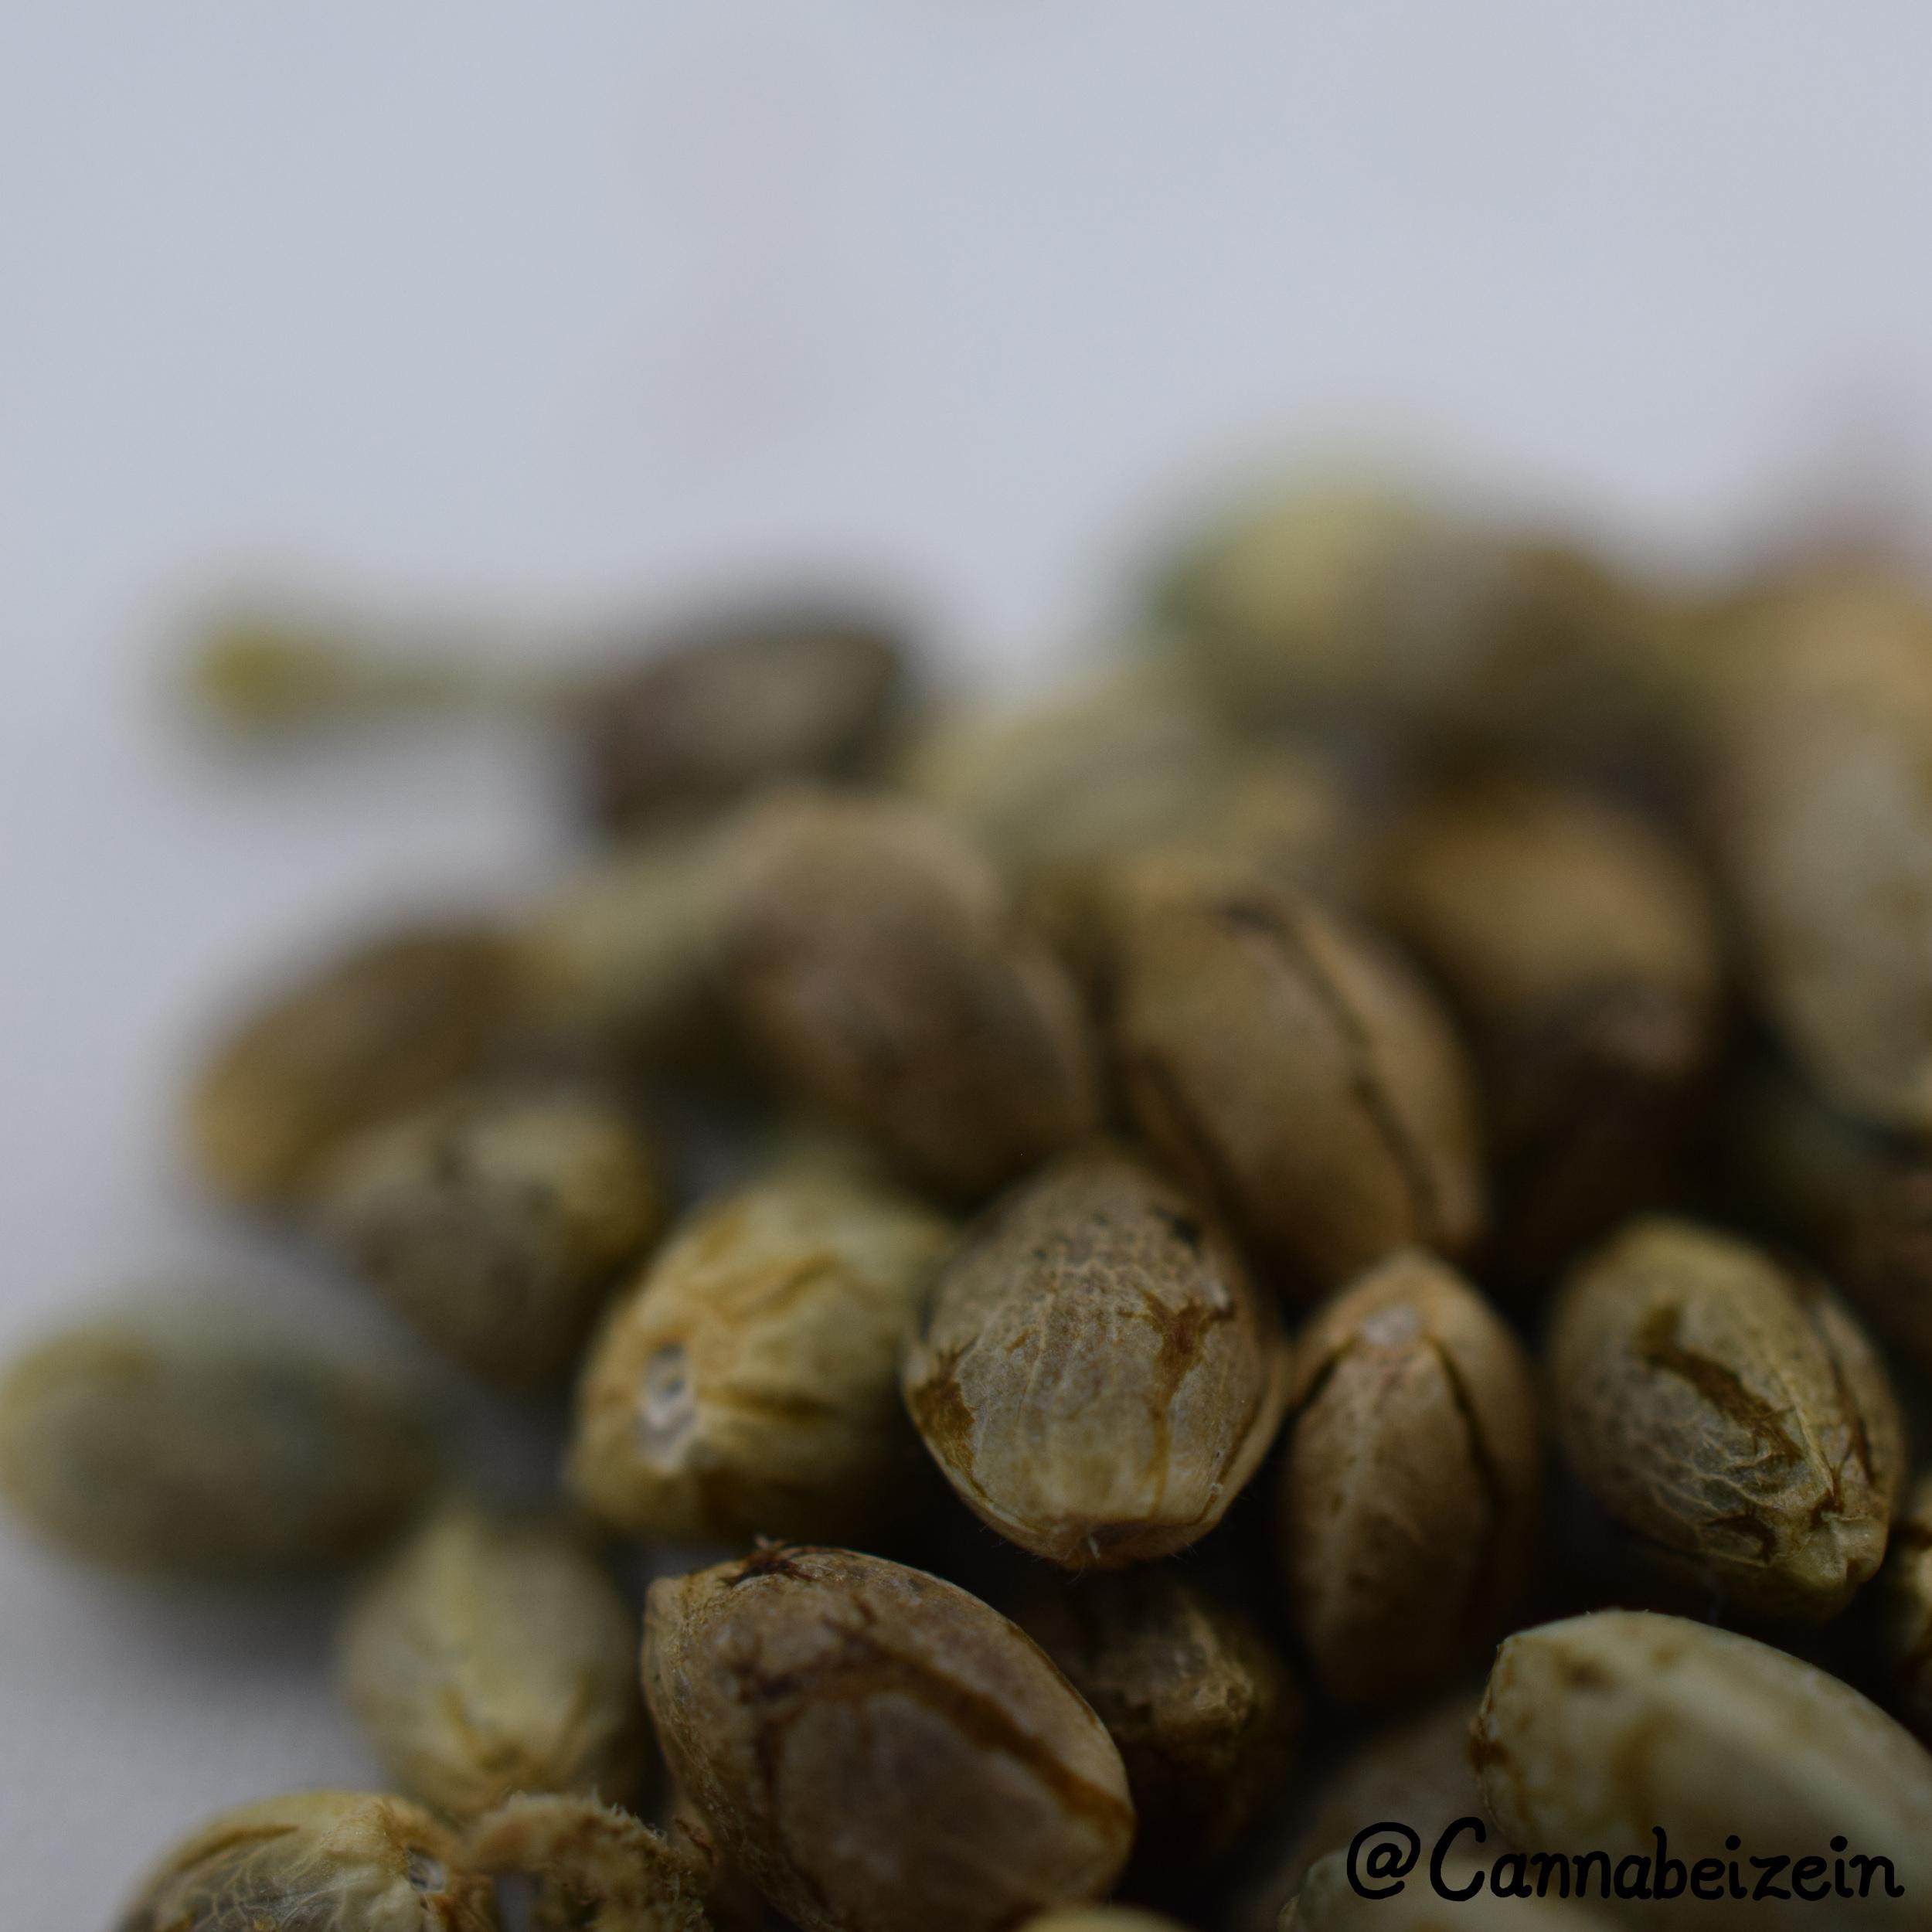 Cannabeizein 0212 - Mystery Mix Seeds - DSC_0842 copy.jpg